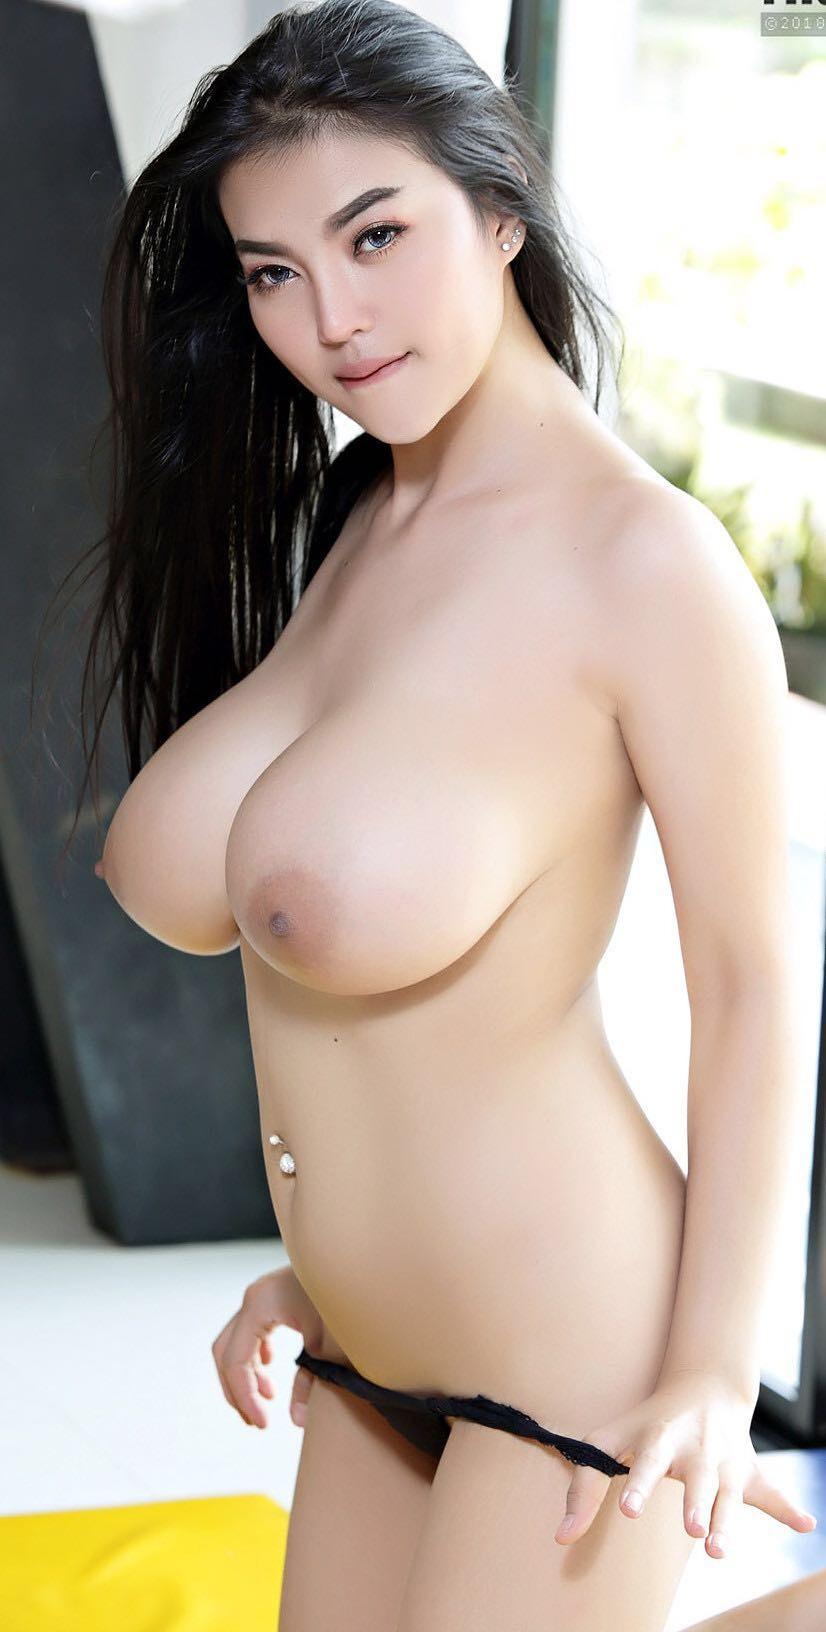 Stunning Japanese Escort Girl Your Sexual Dreams Come True - Dubai Bunnies